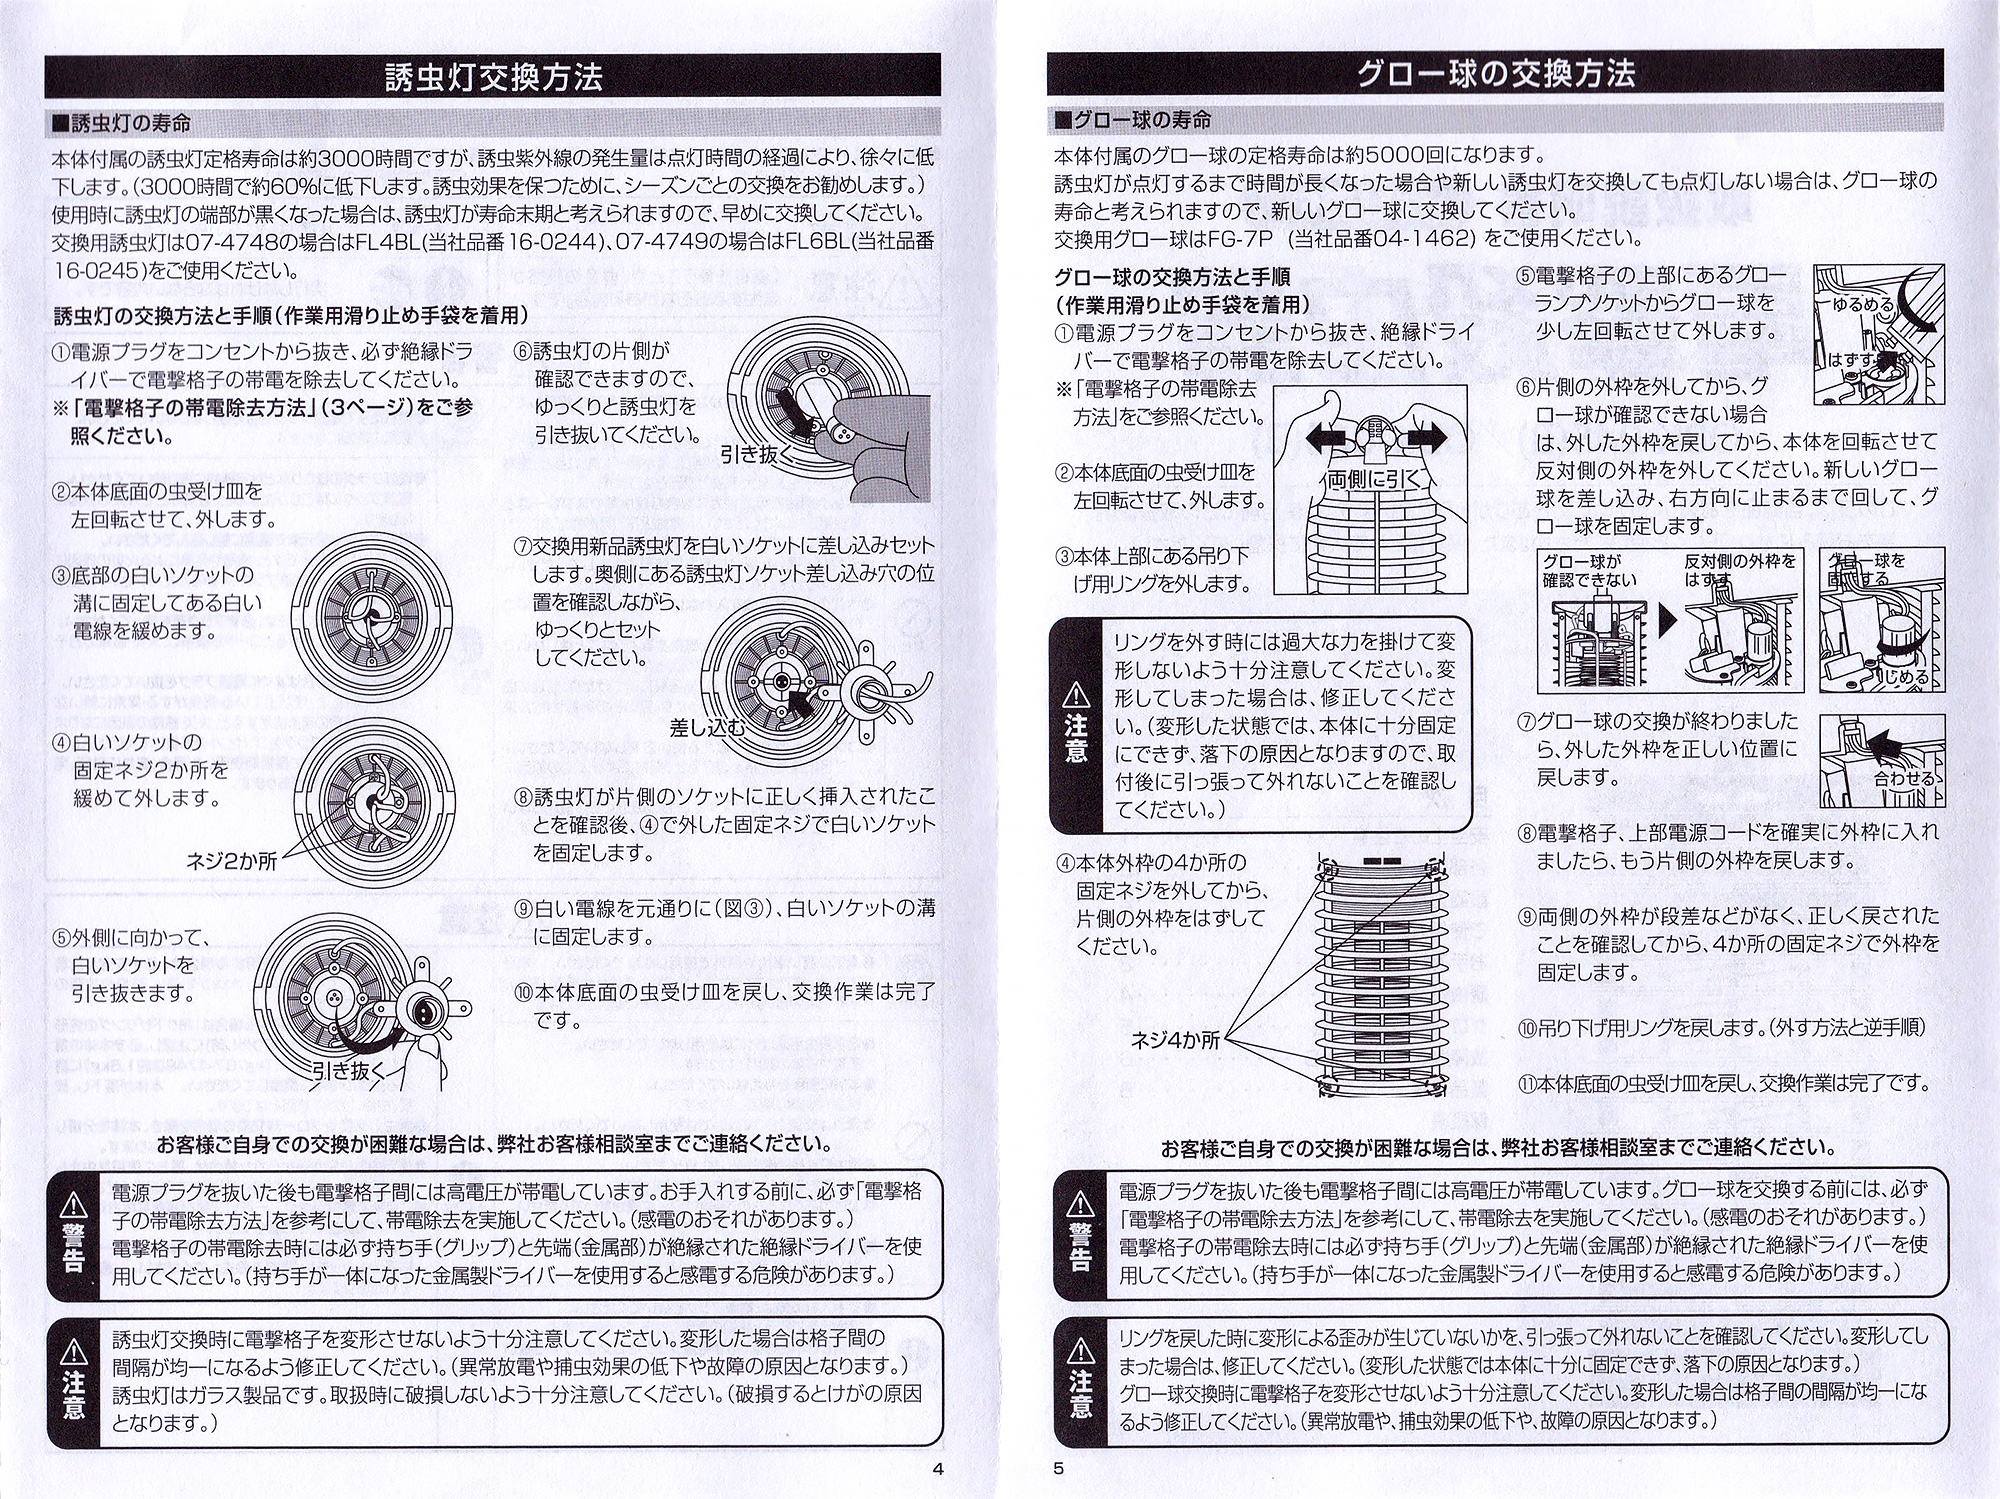 オーム電機 電撃殺虫器 OBK-04S 説明書